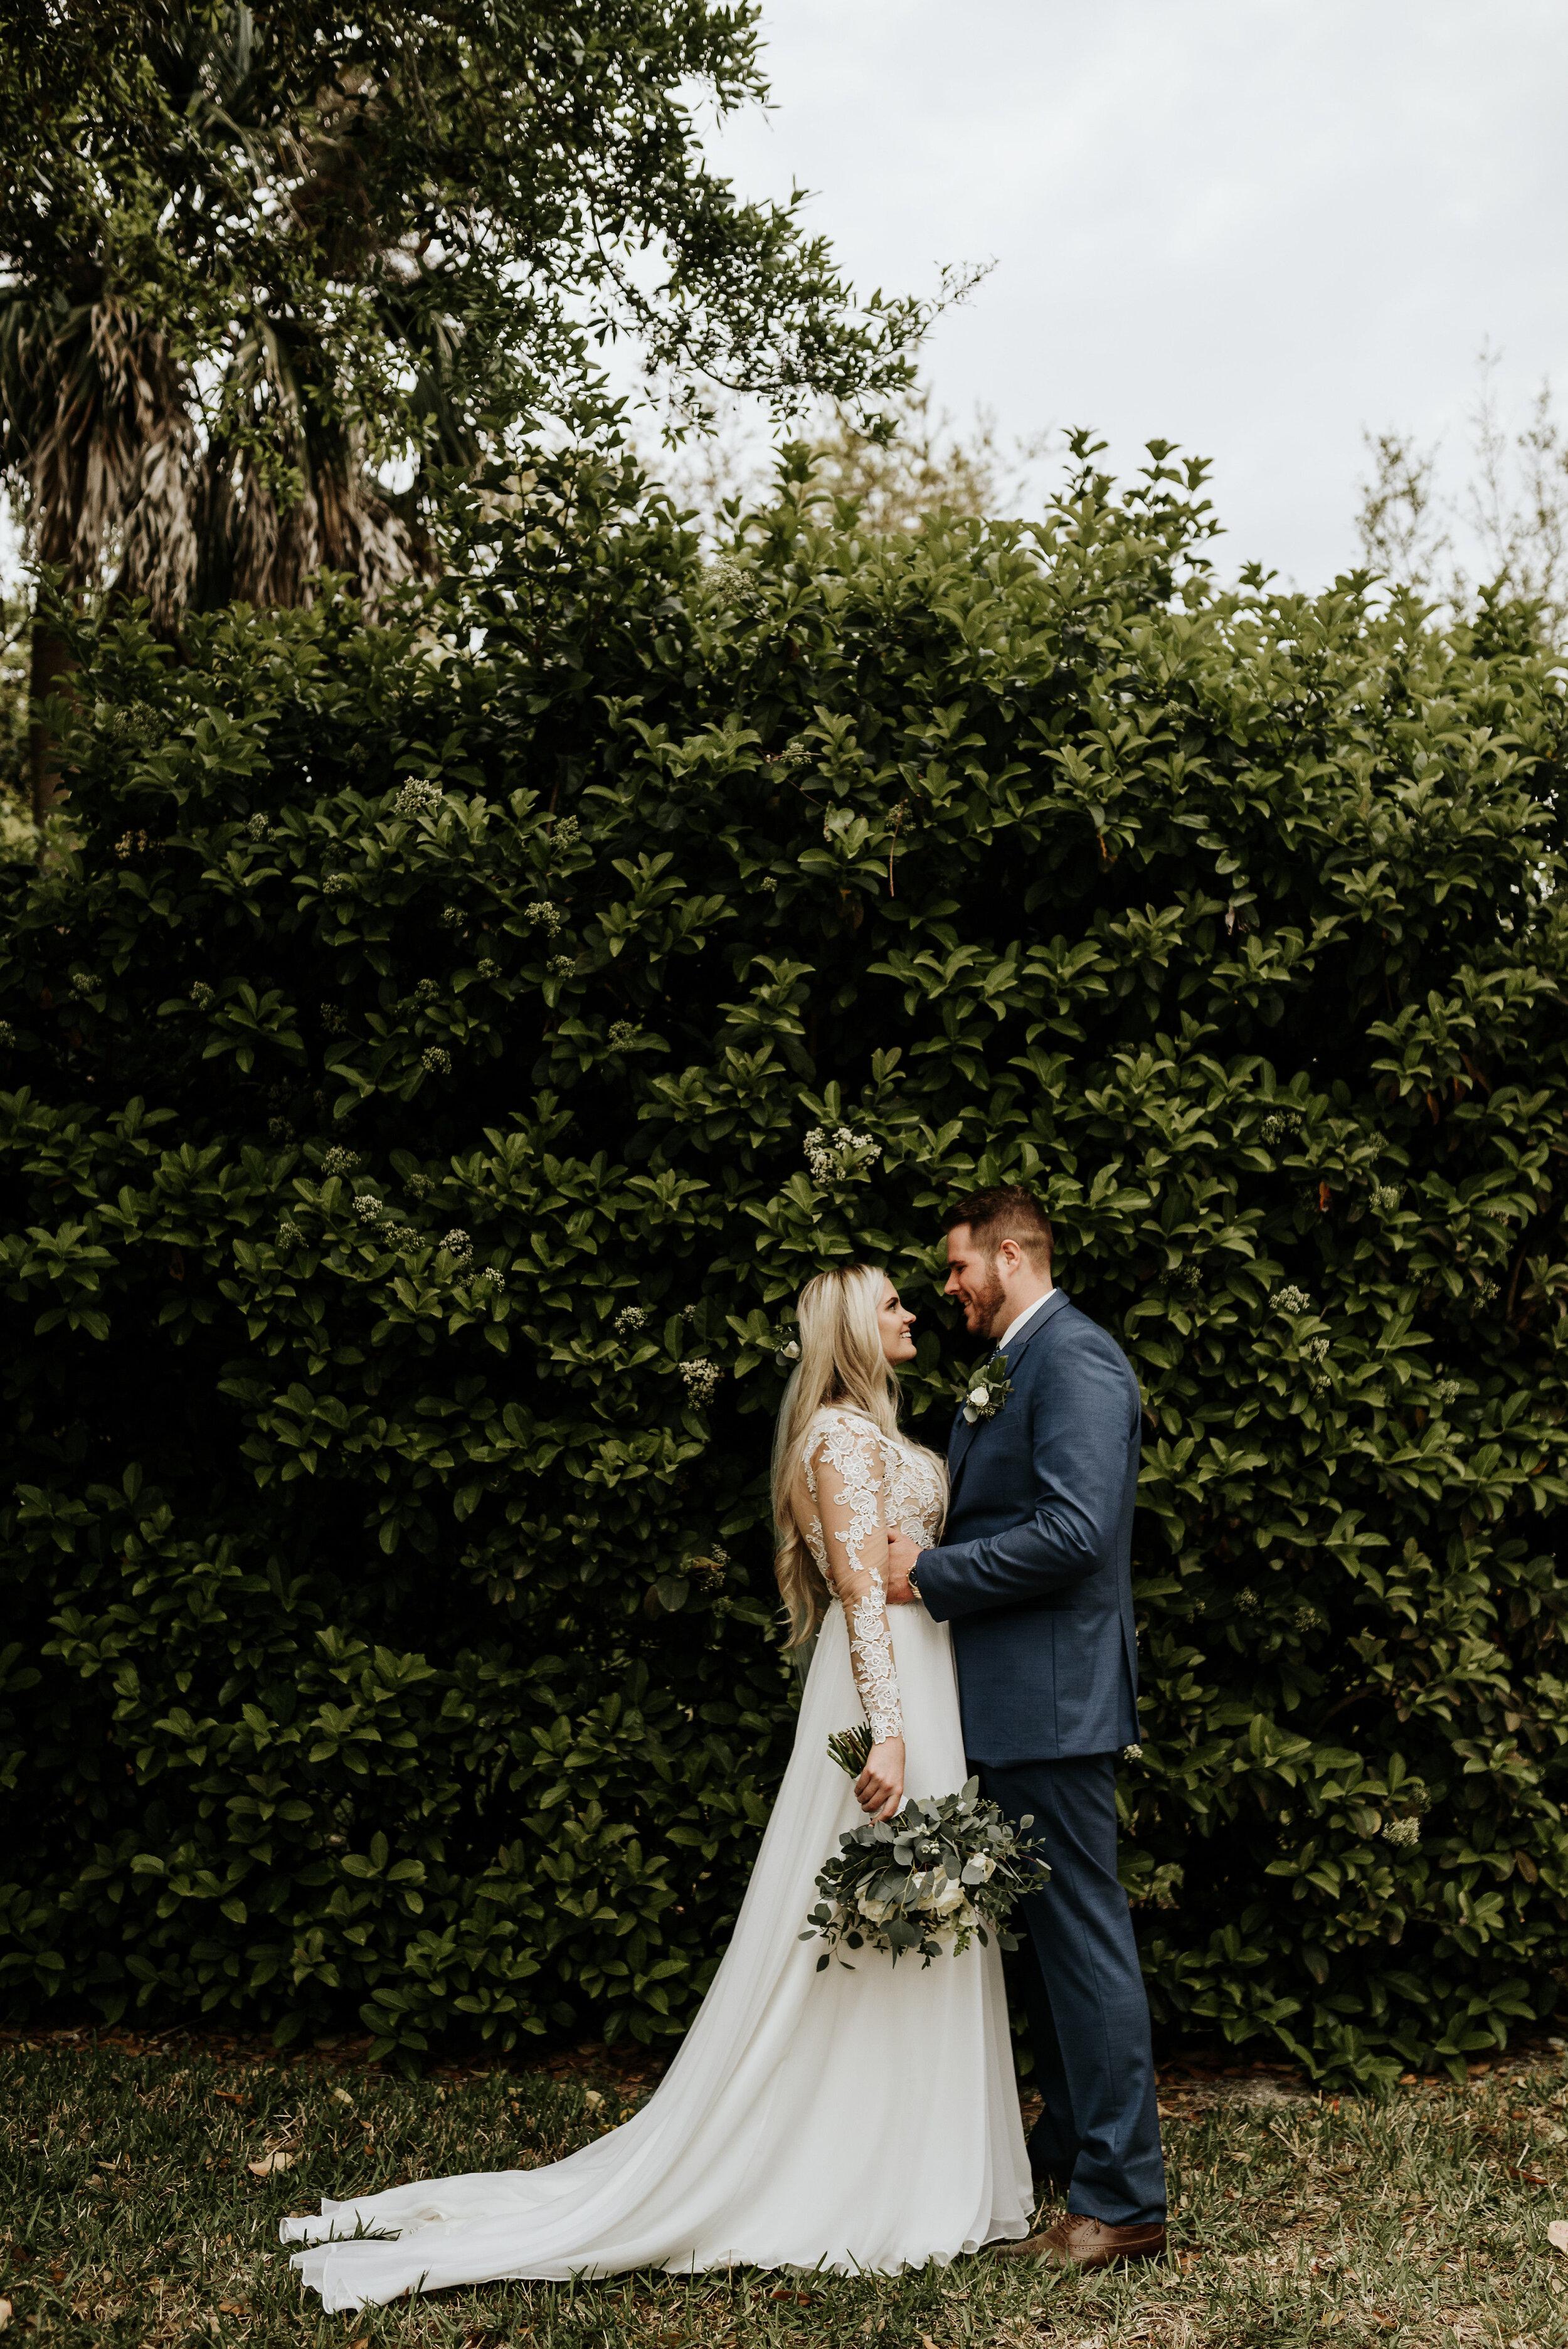 Mikenzi_Brad_Wedding_The_Delamater_House_New_Smyrna_Beach_Florida_Photography_by_V_0663.jpg